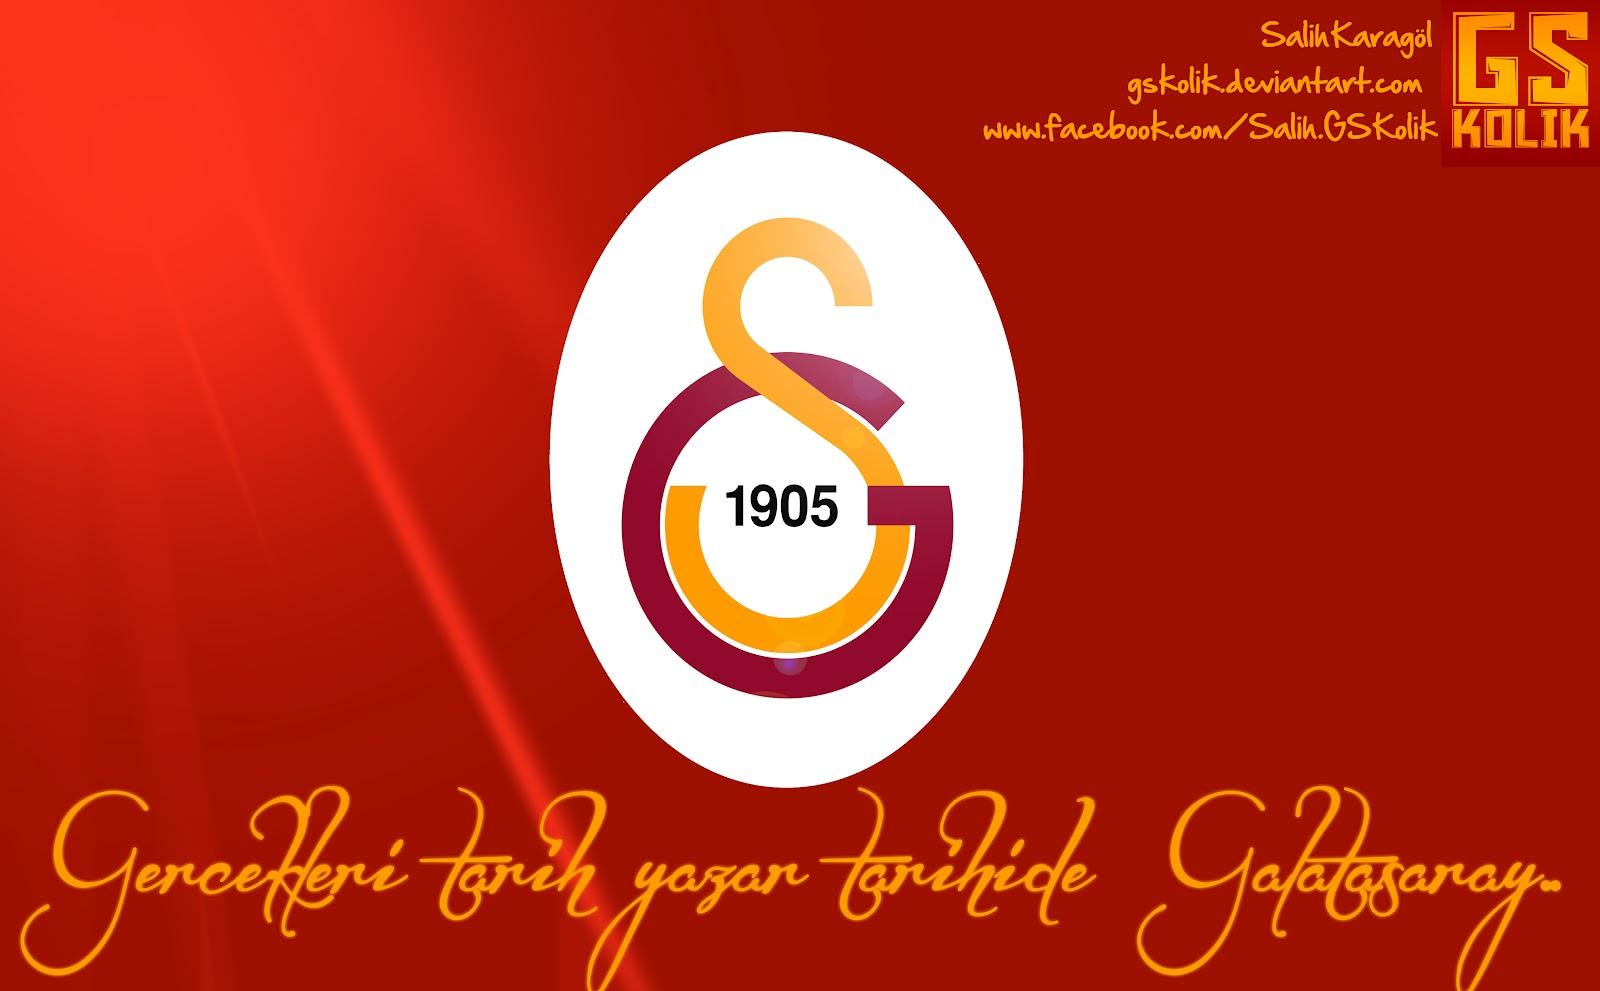 Killzone Shadow Fall Wallpaper 1080p En G 252 Zel Galatasaray Hd Resimleri Galatasaray Hd